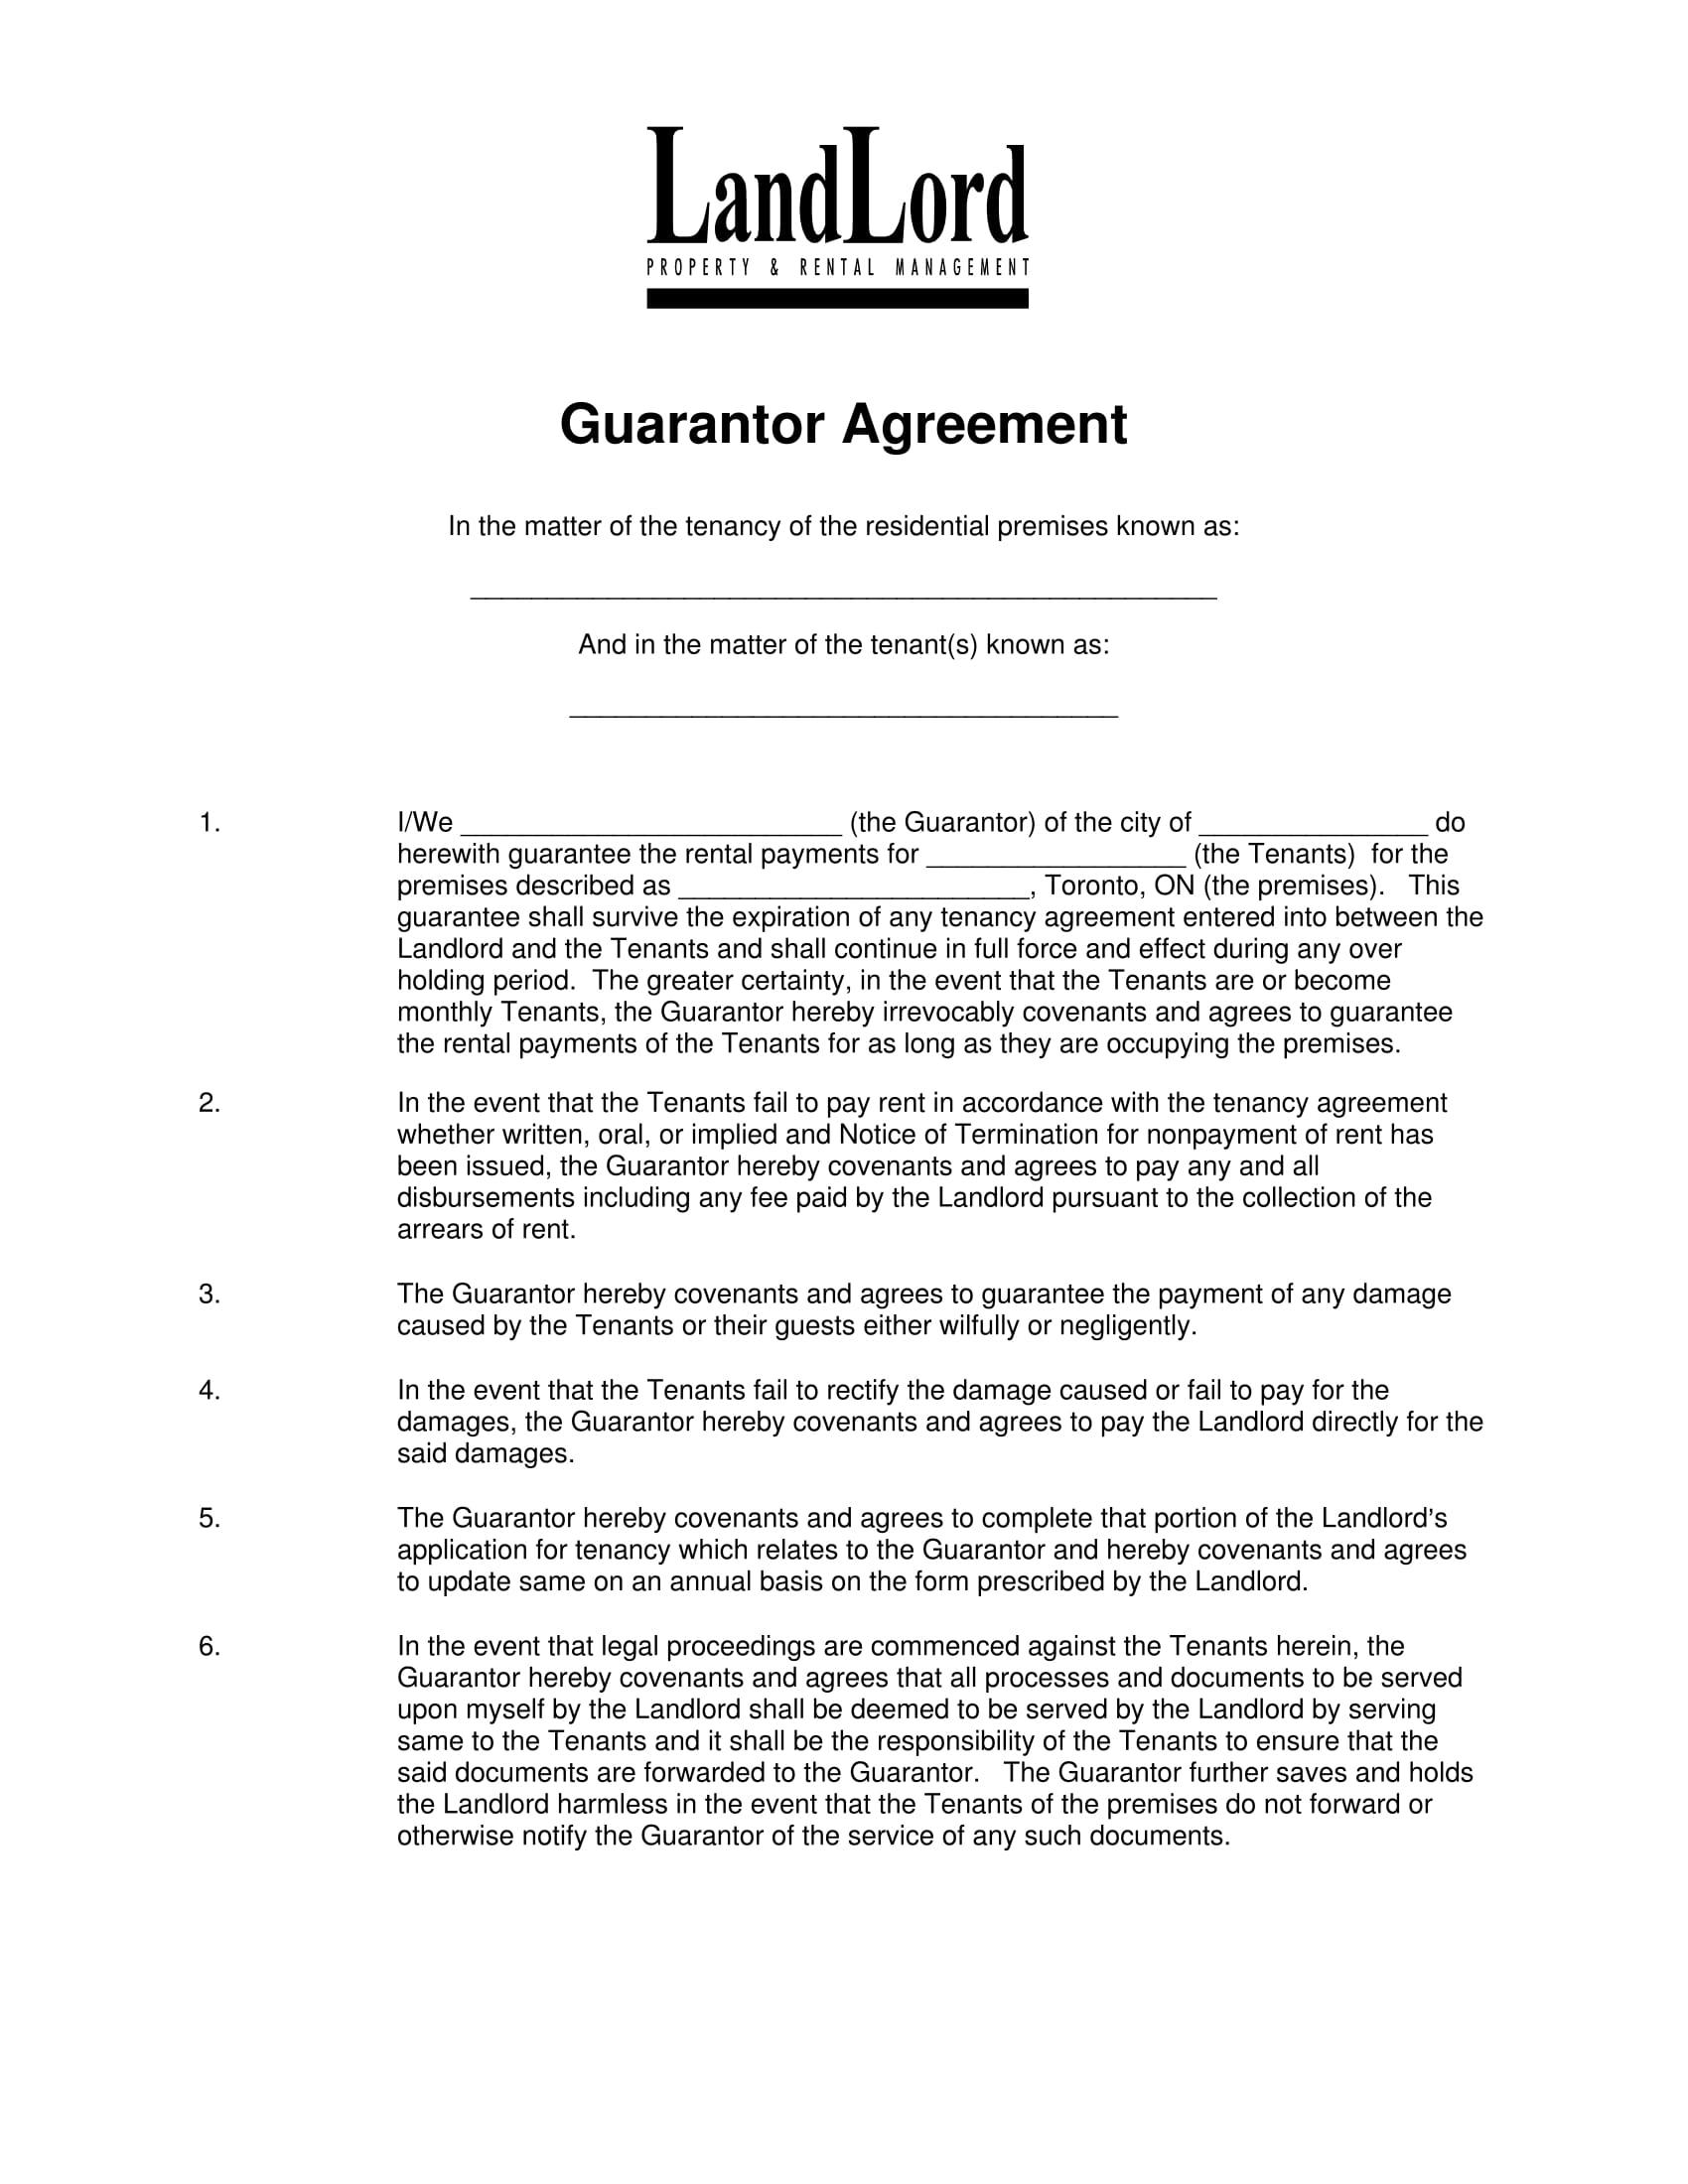 guarantor agreement form 1